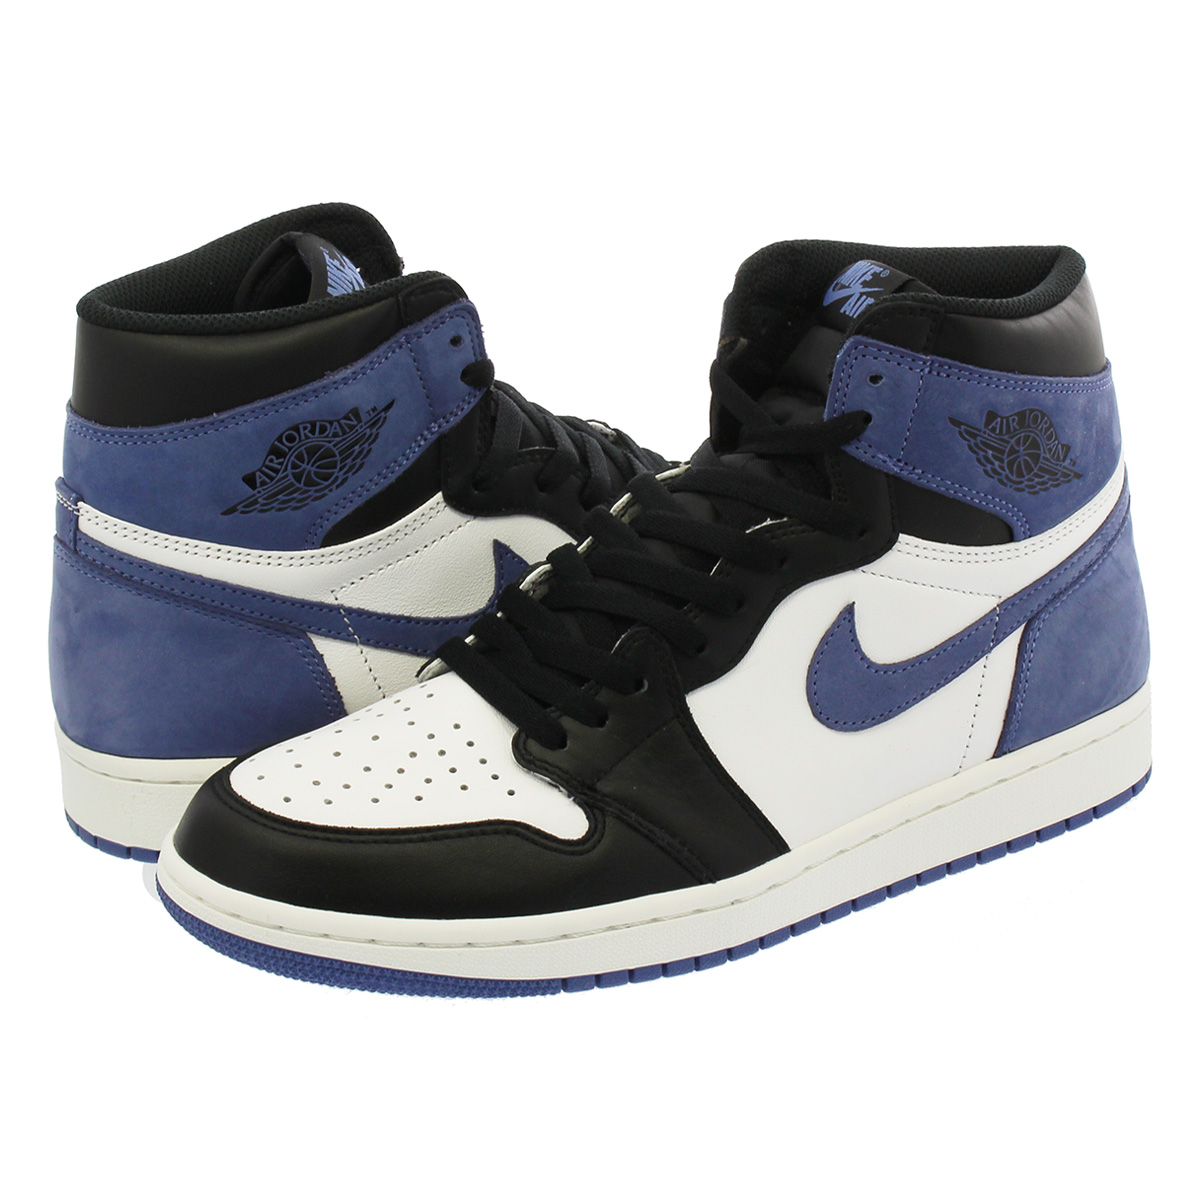 1fed96595470 NIKE AIR JORDAN 1 RETRO HIGH OG Nike Air Jordan 1 nostalgic high OG SUMMIT  WHITE BLUE MOON BLACK 555